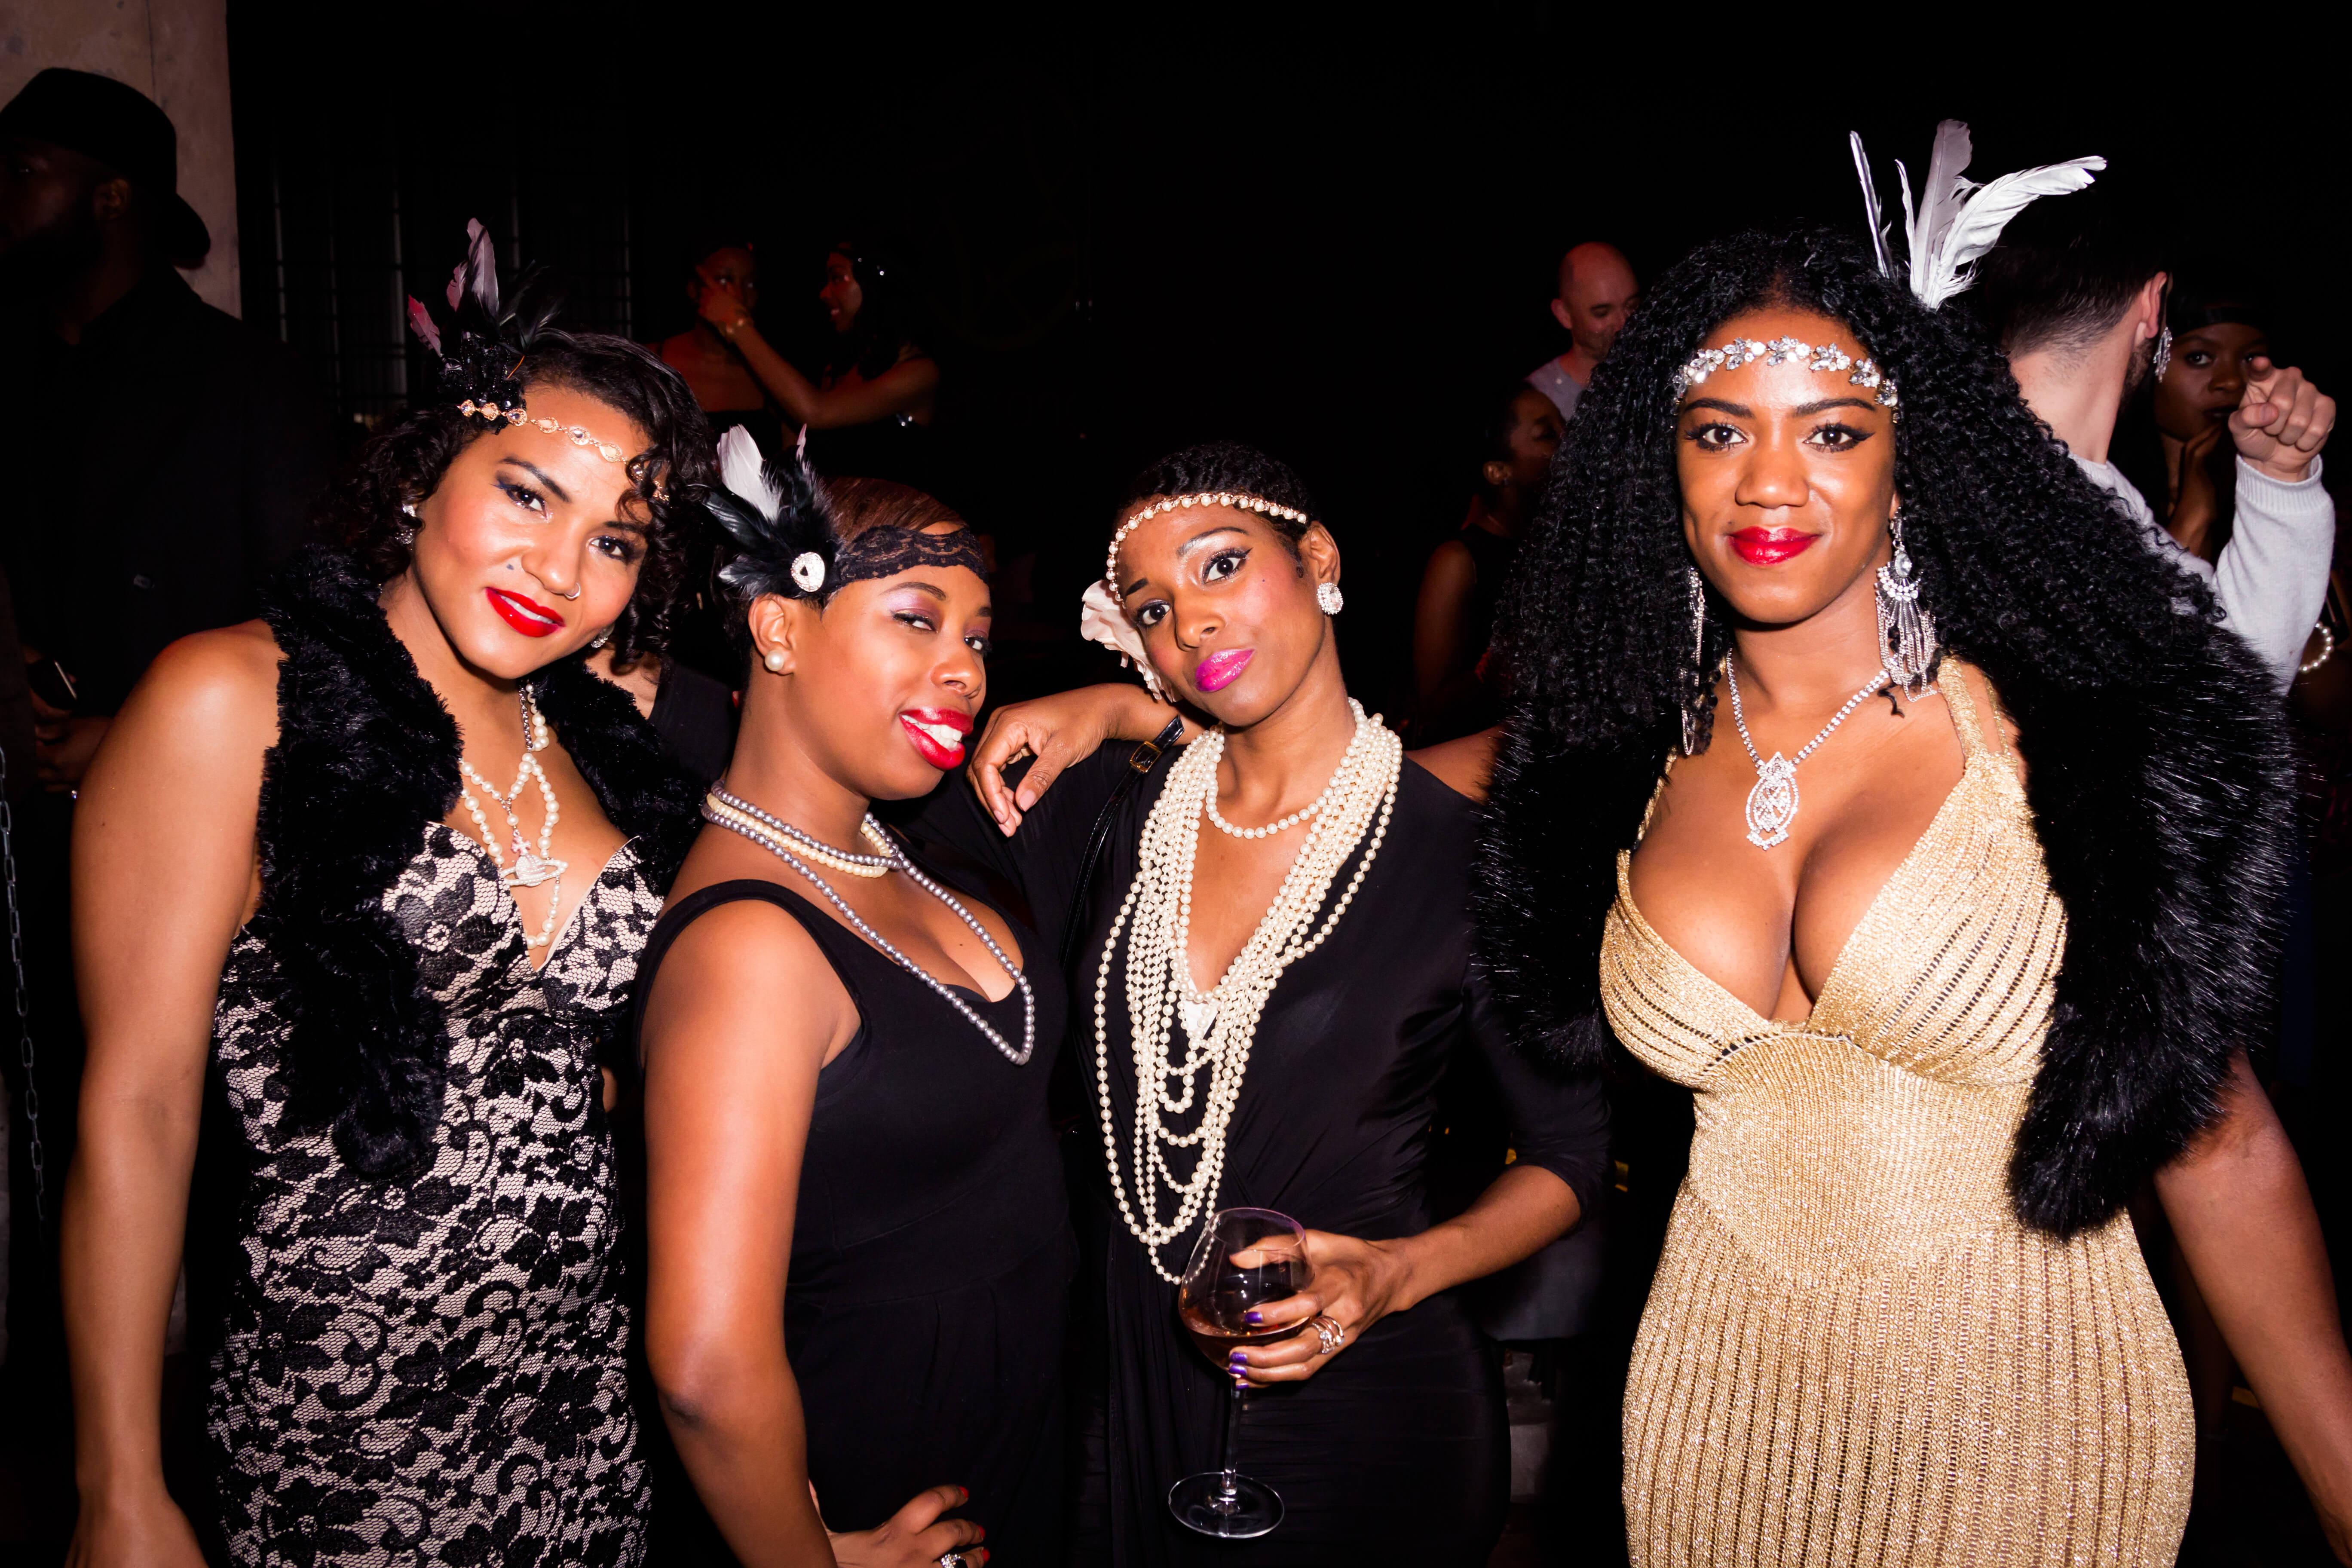 #CityNights: Networking + Harlem Renaissance Casino Party